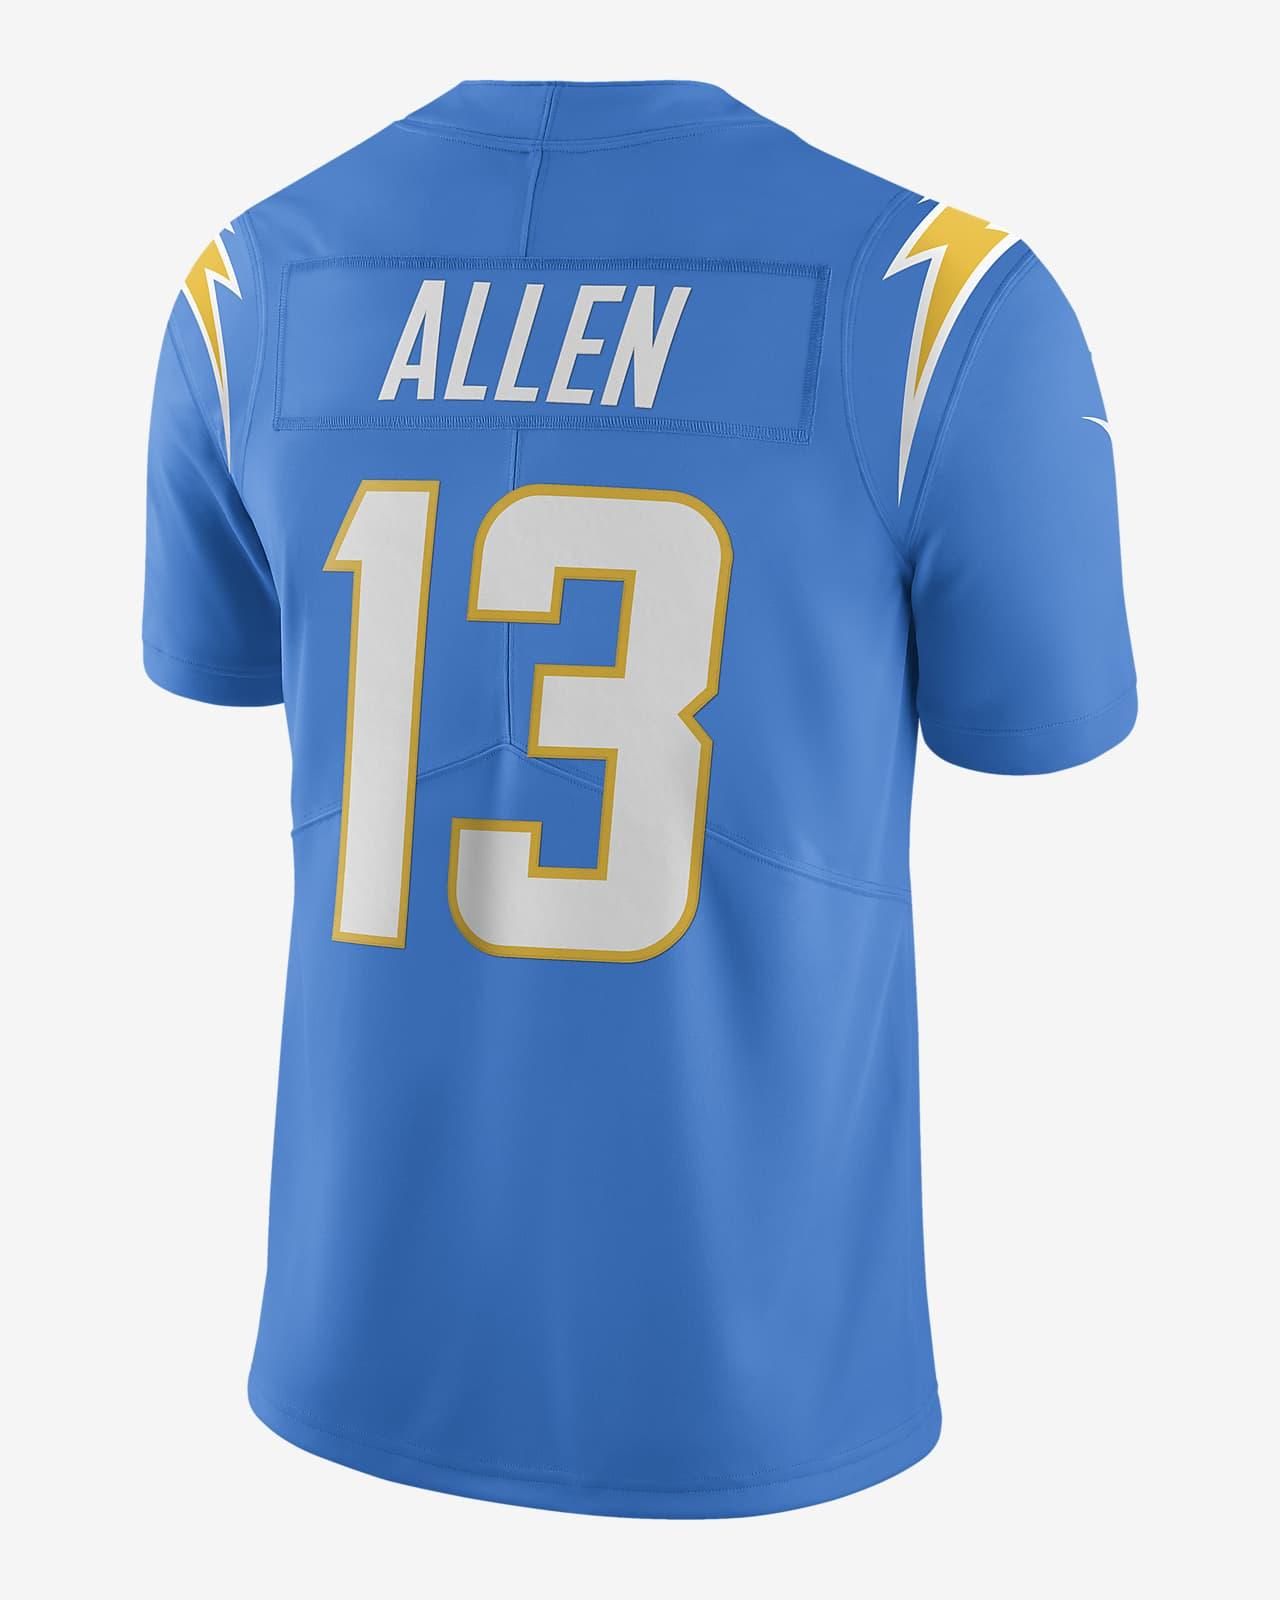 NFL Los Angeles Chargers Vapor Untouchable (Keenan Allen) Men's Limited Football Jersey